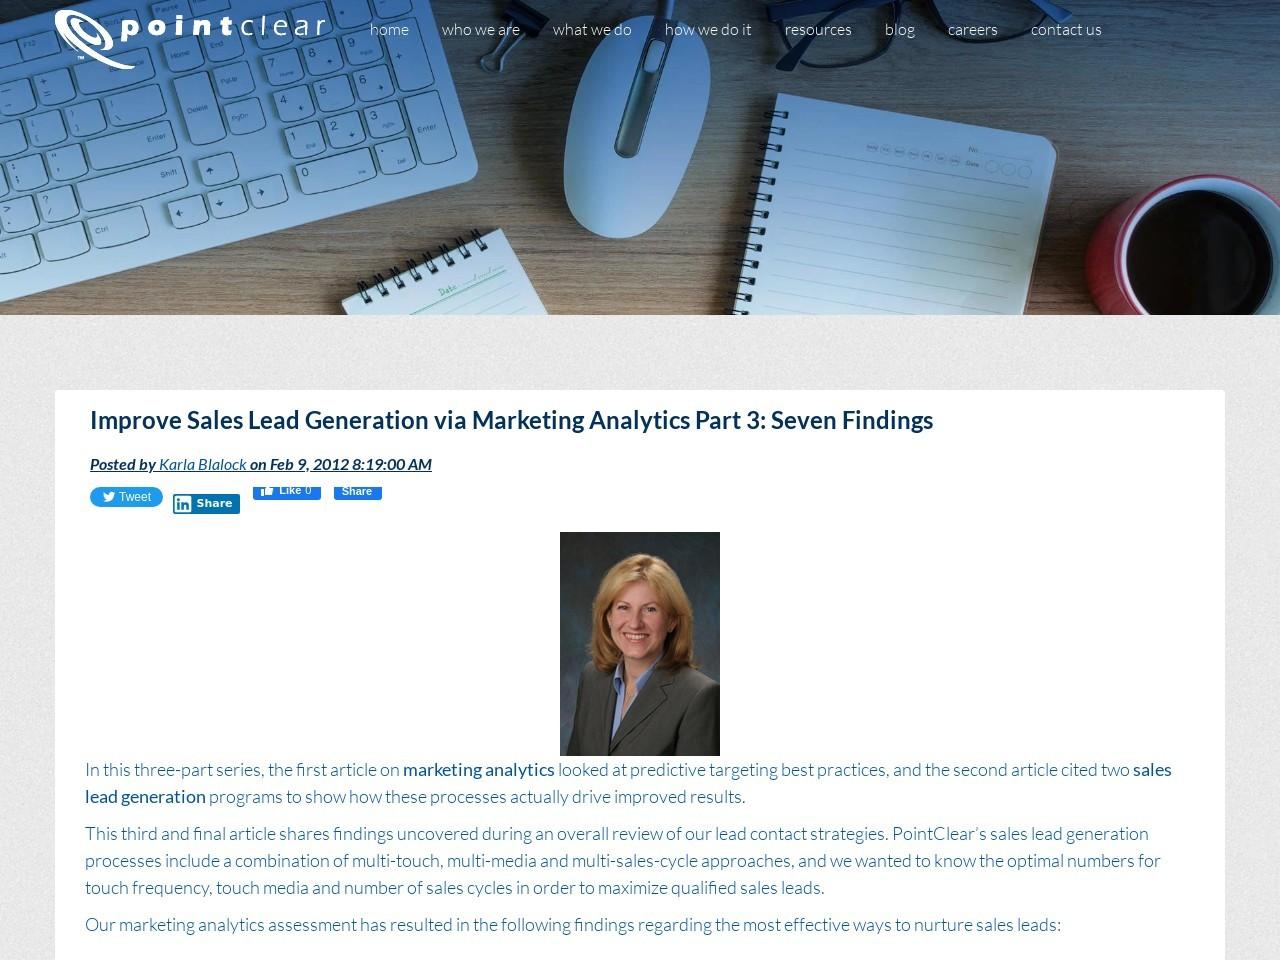 Improve Sales Lead Generation via Marketing Analytics Part 3